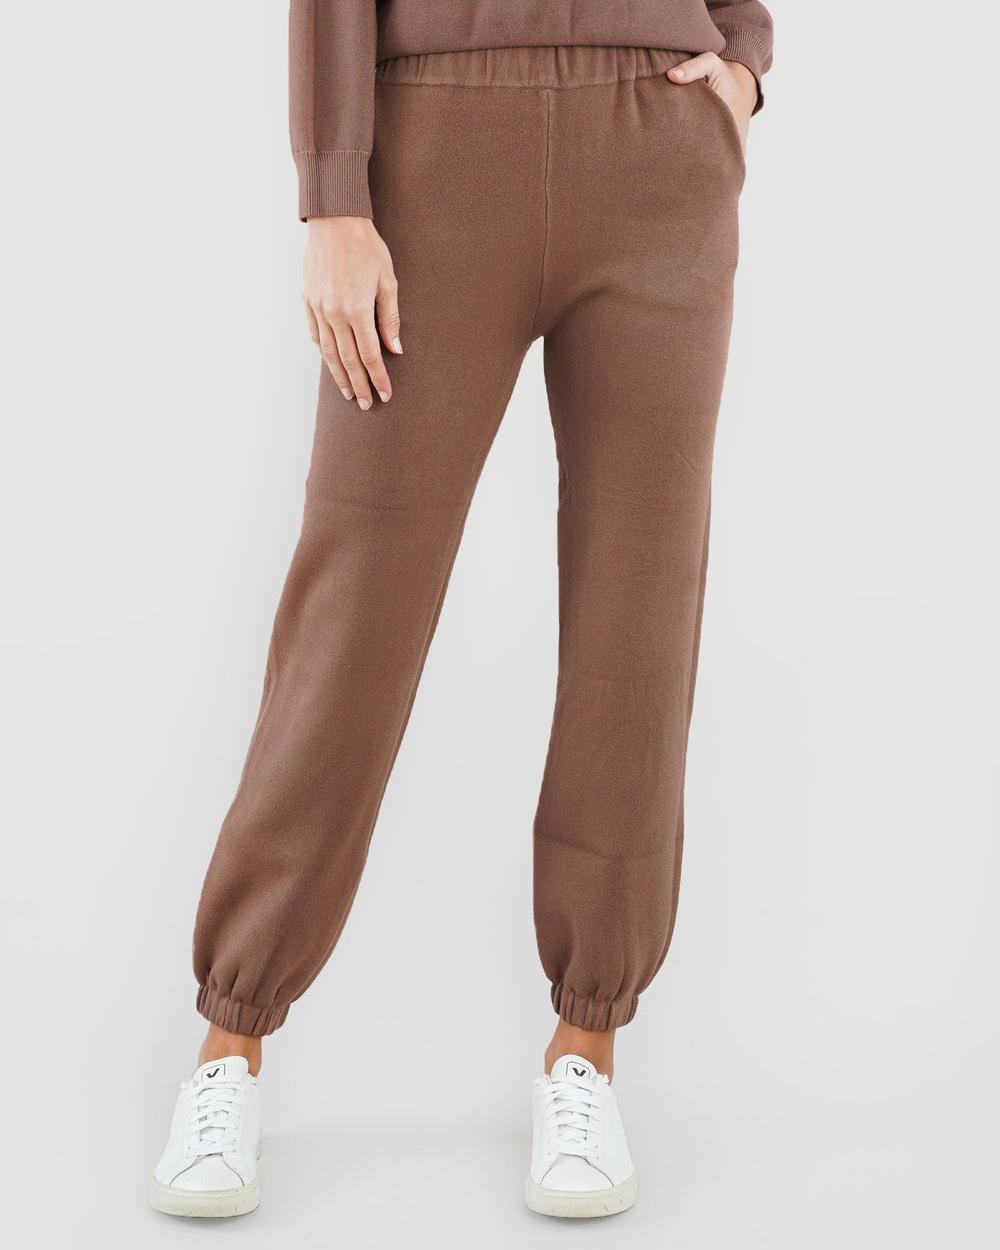 Amelius Titan Knit Jogger Sweatpants Cocoa